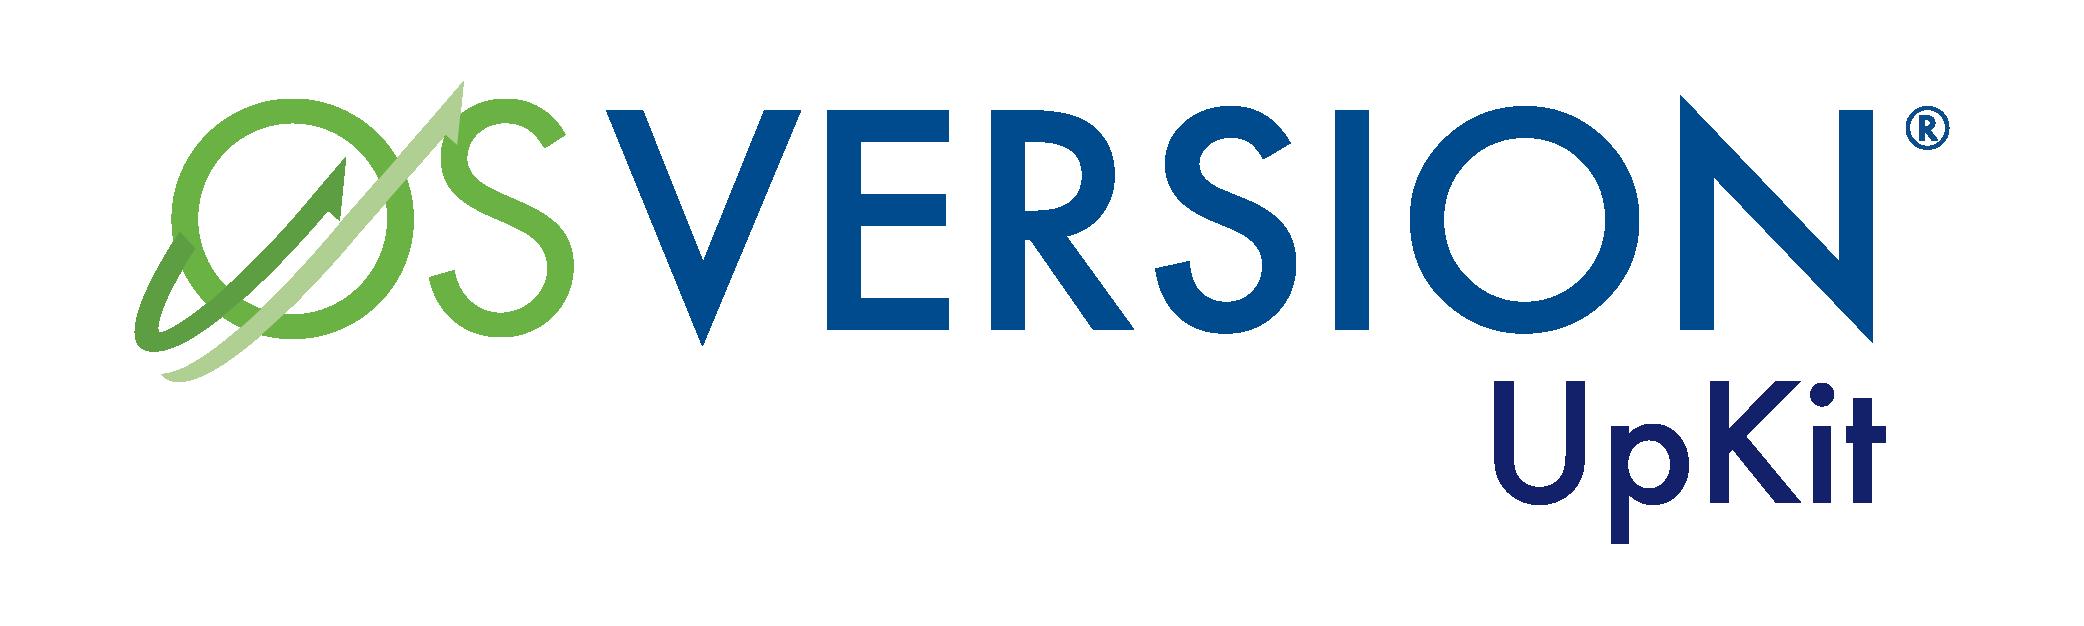 OS Version Logo